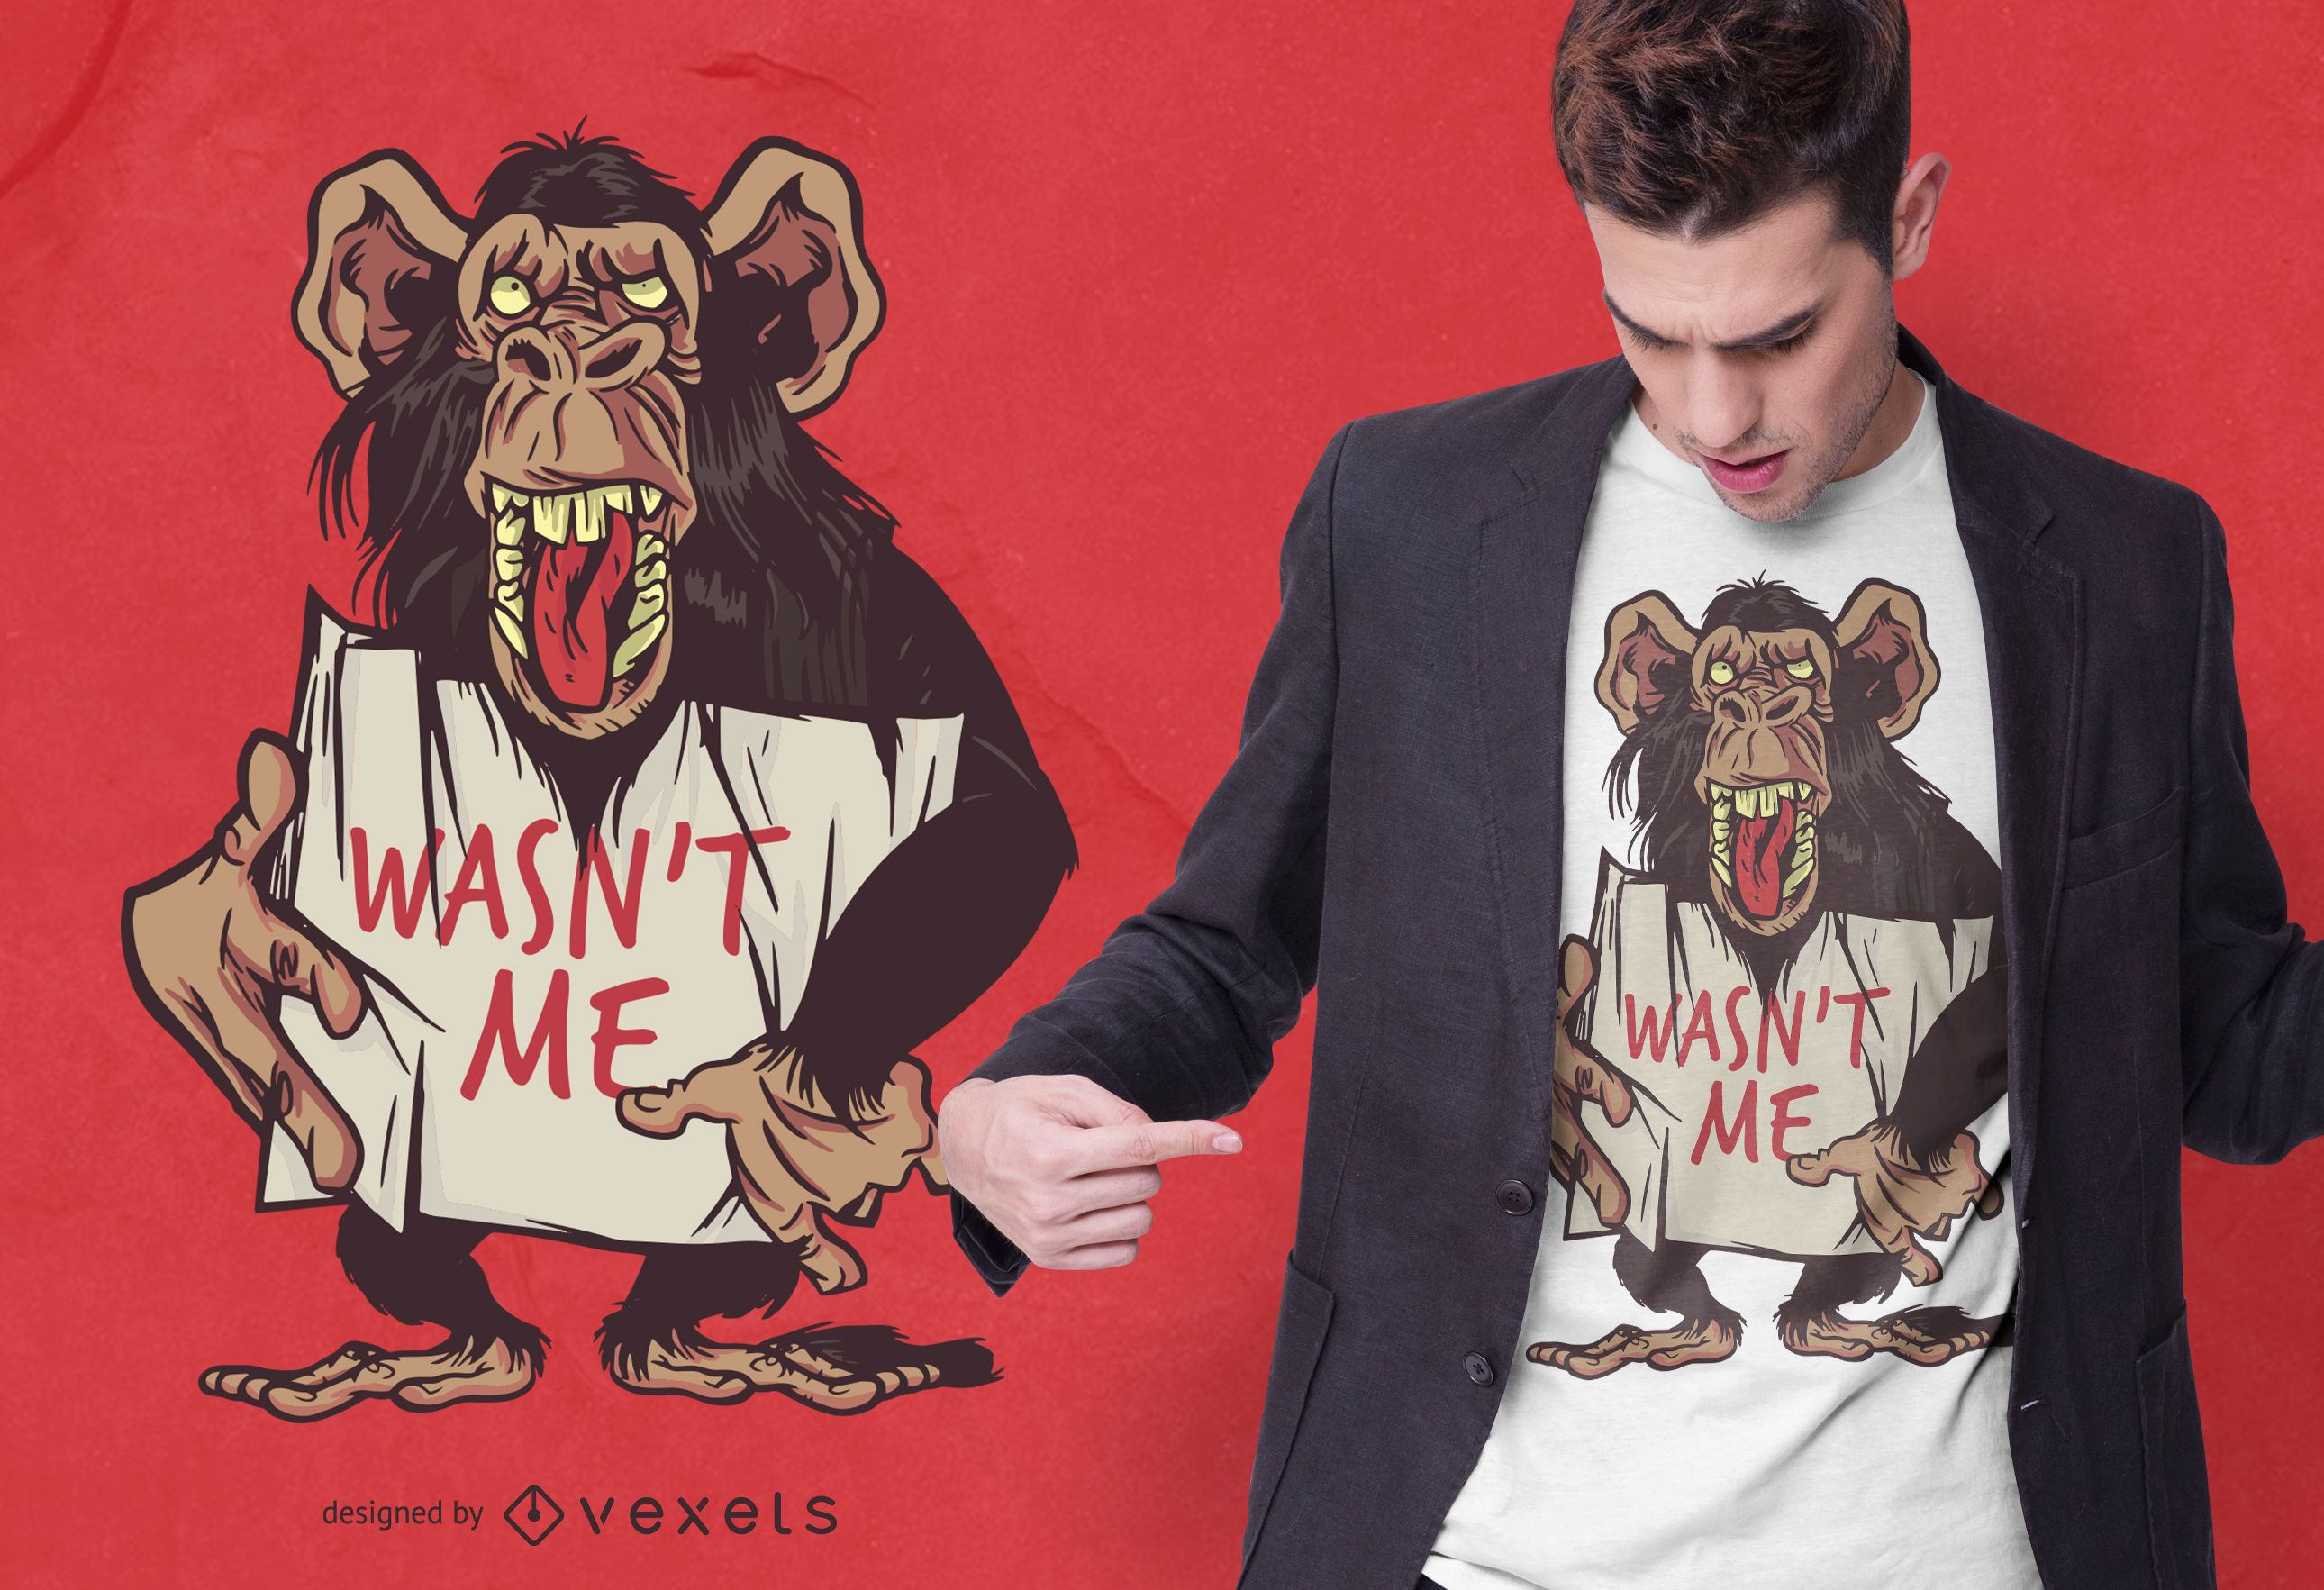 Monkey wasn't me t-shirt design